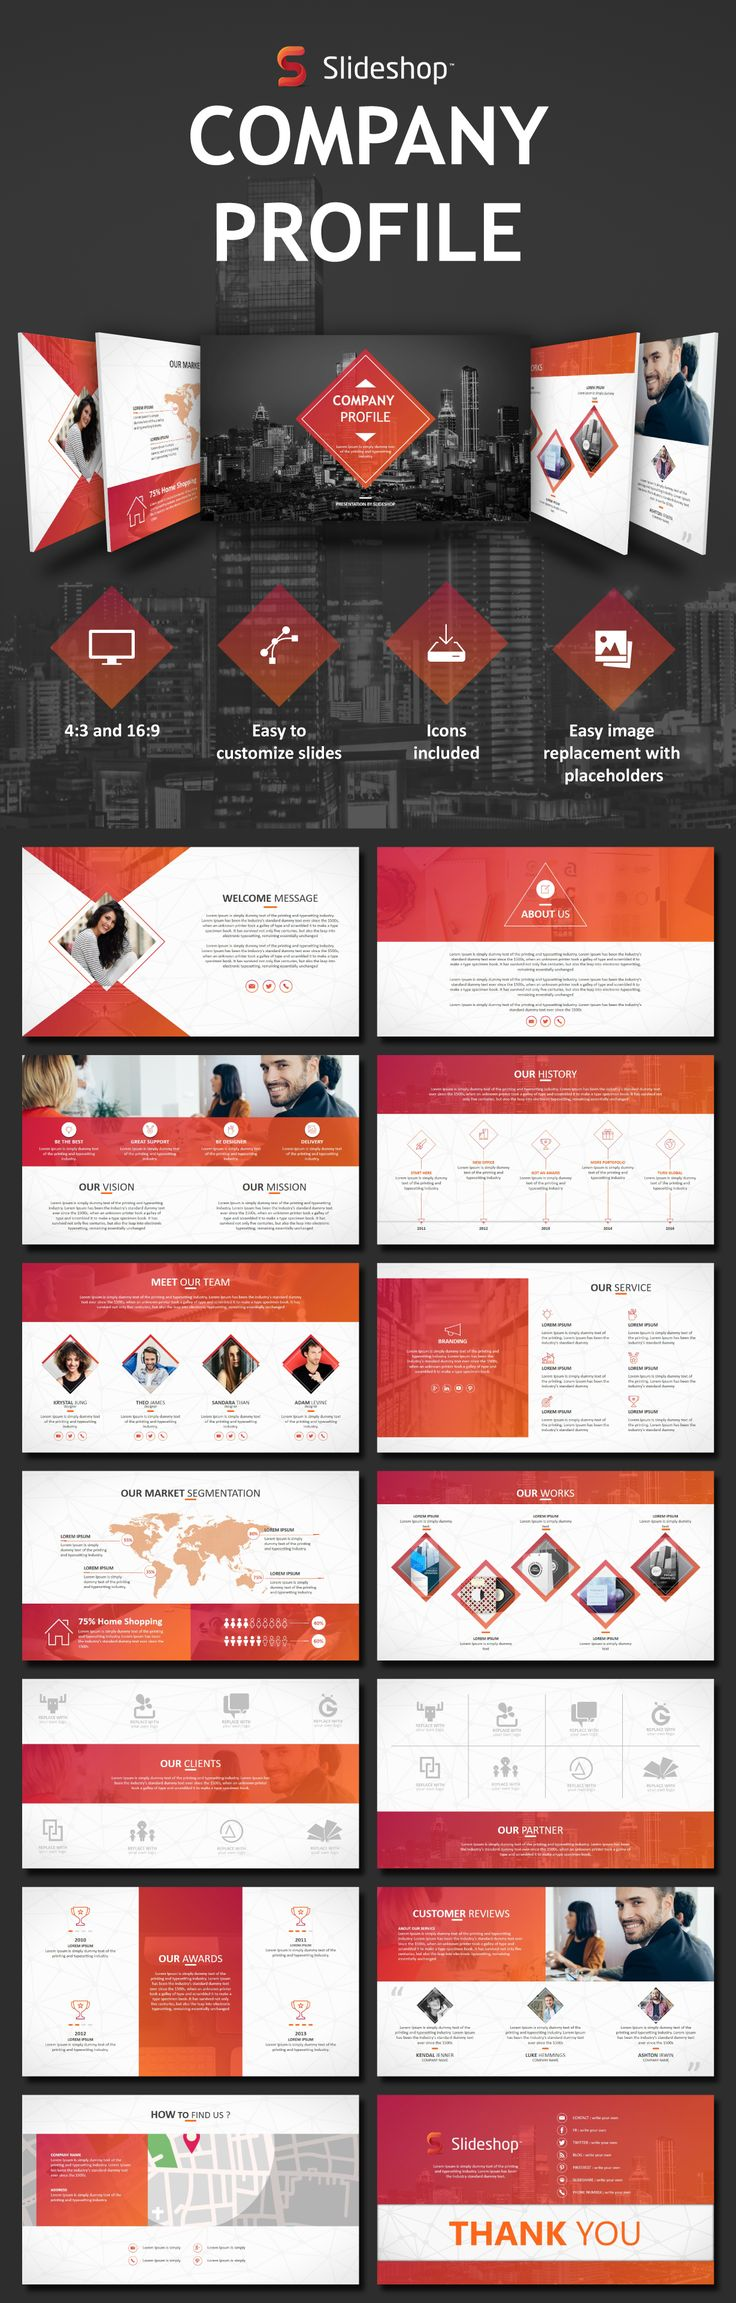 53 best random powerpoint templates images on pinterest company profile powerpoint template slidedesign presentationdesign toneelgroepblik Image collections